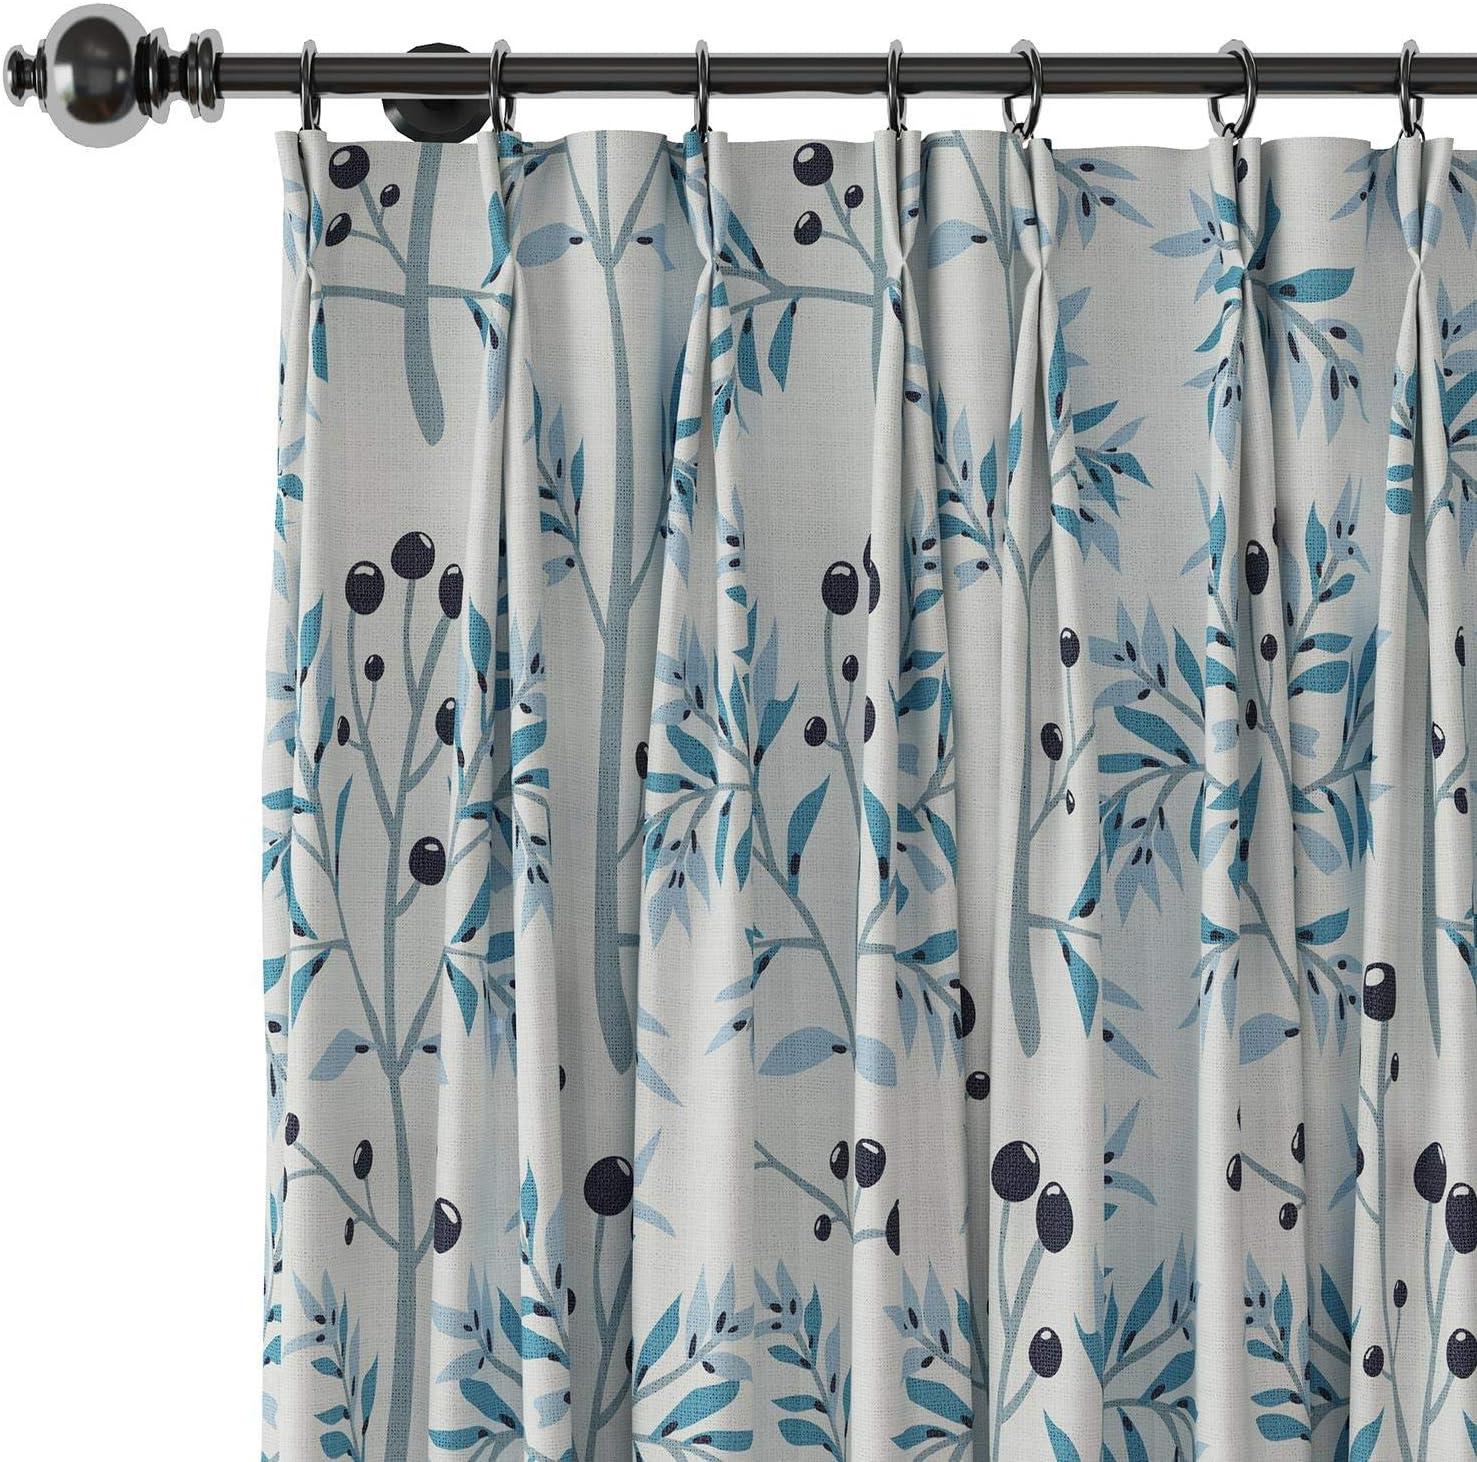 ChadMade Linen Texture Printed List price Pleated Curtain Botantical Pinch San Diego Mall